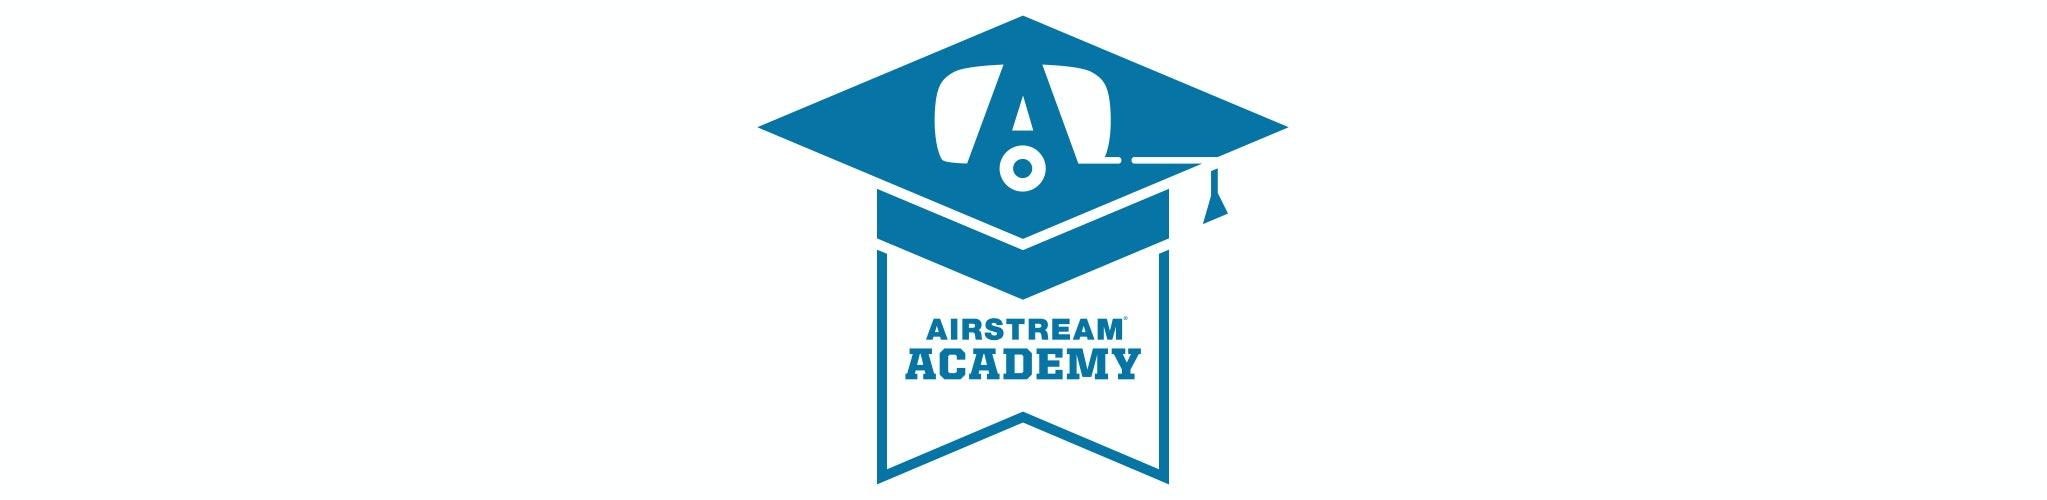 Airstream Academy